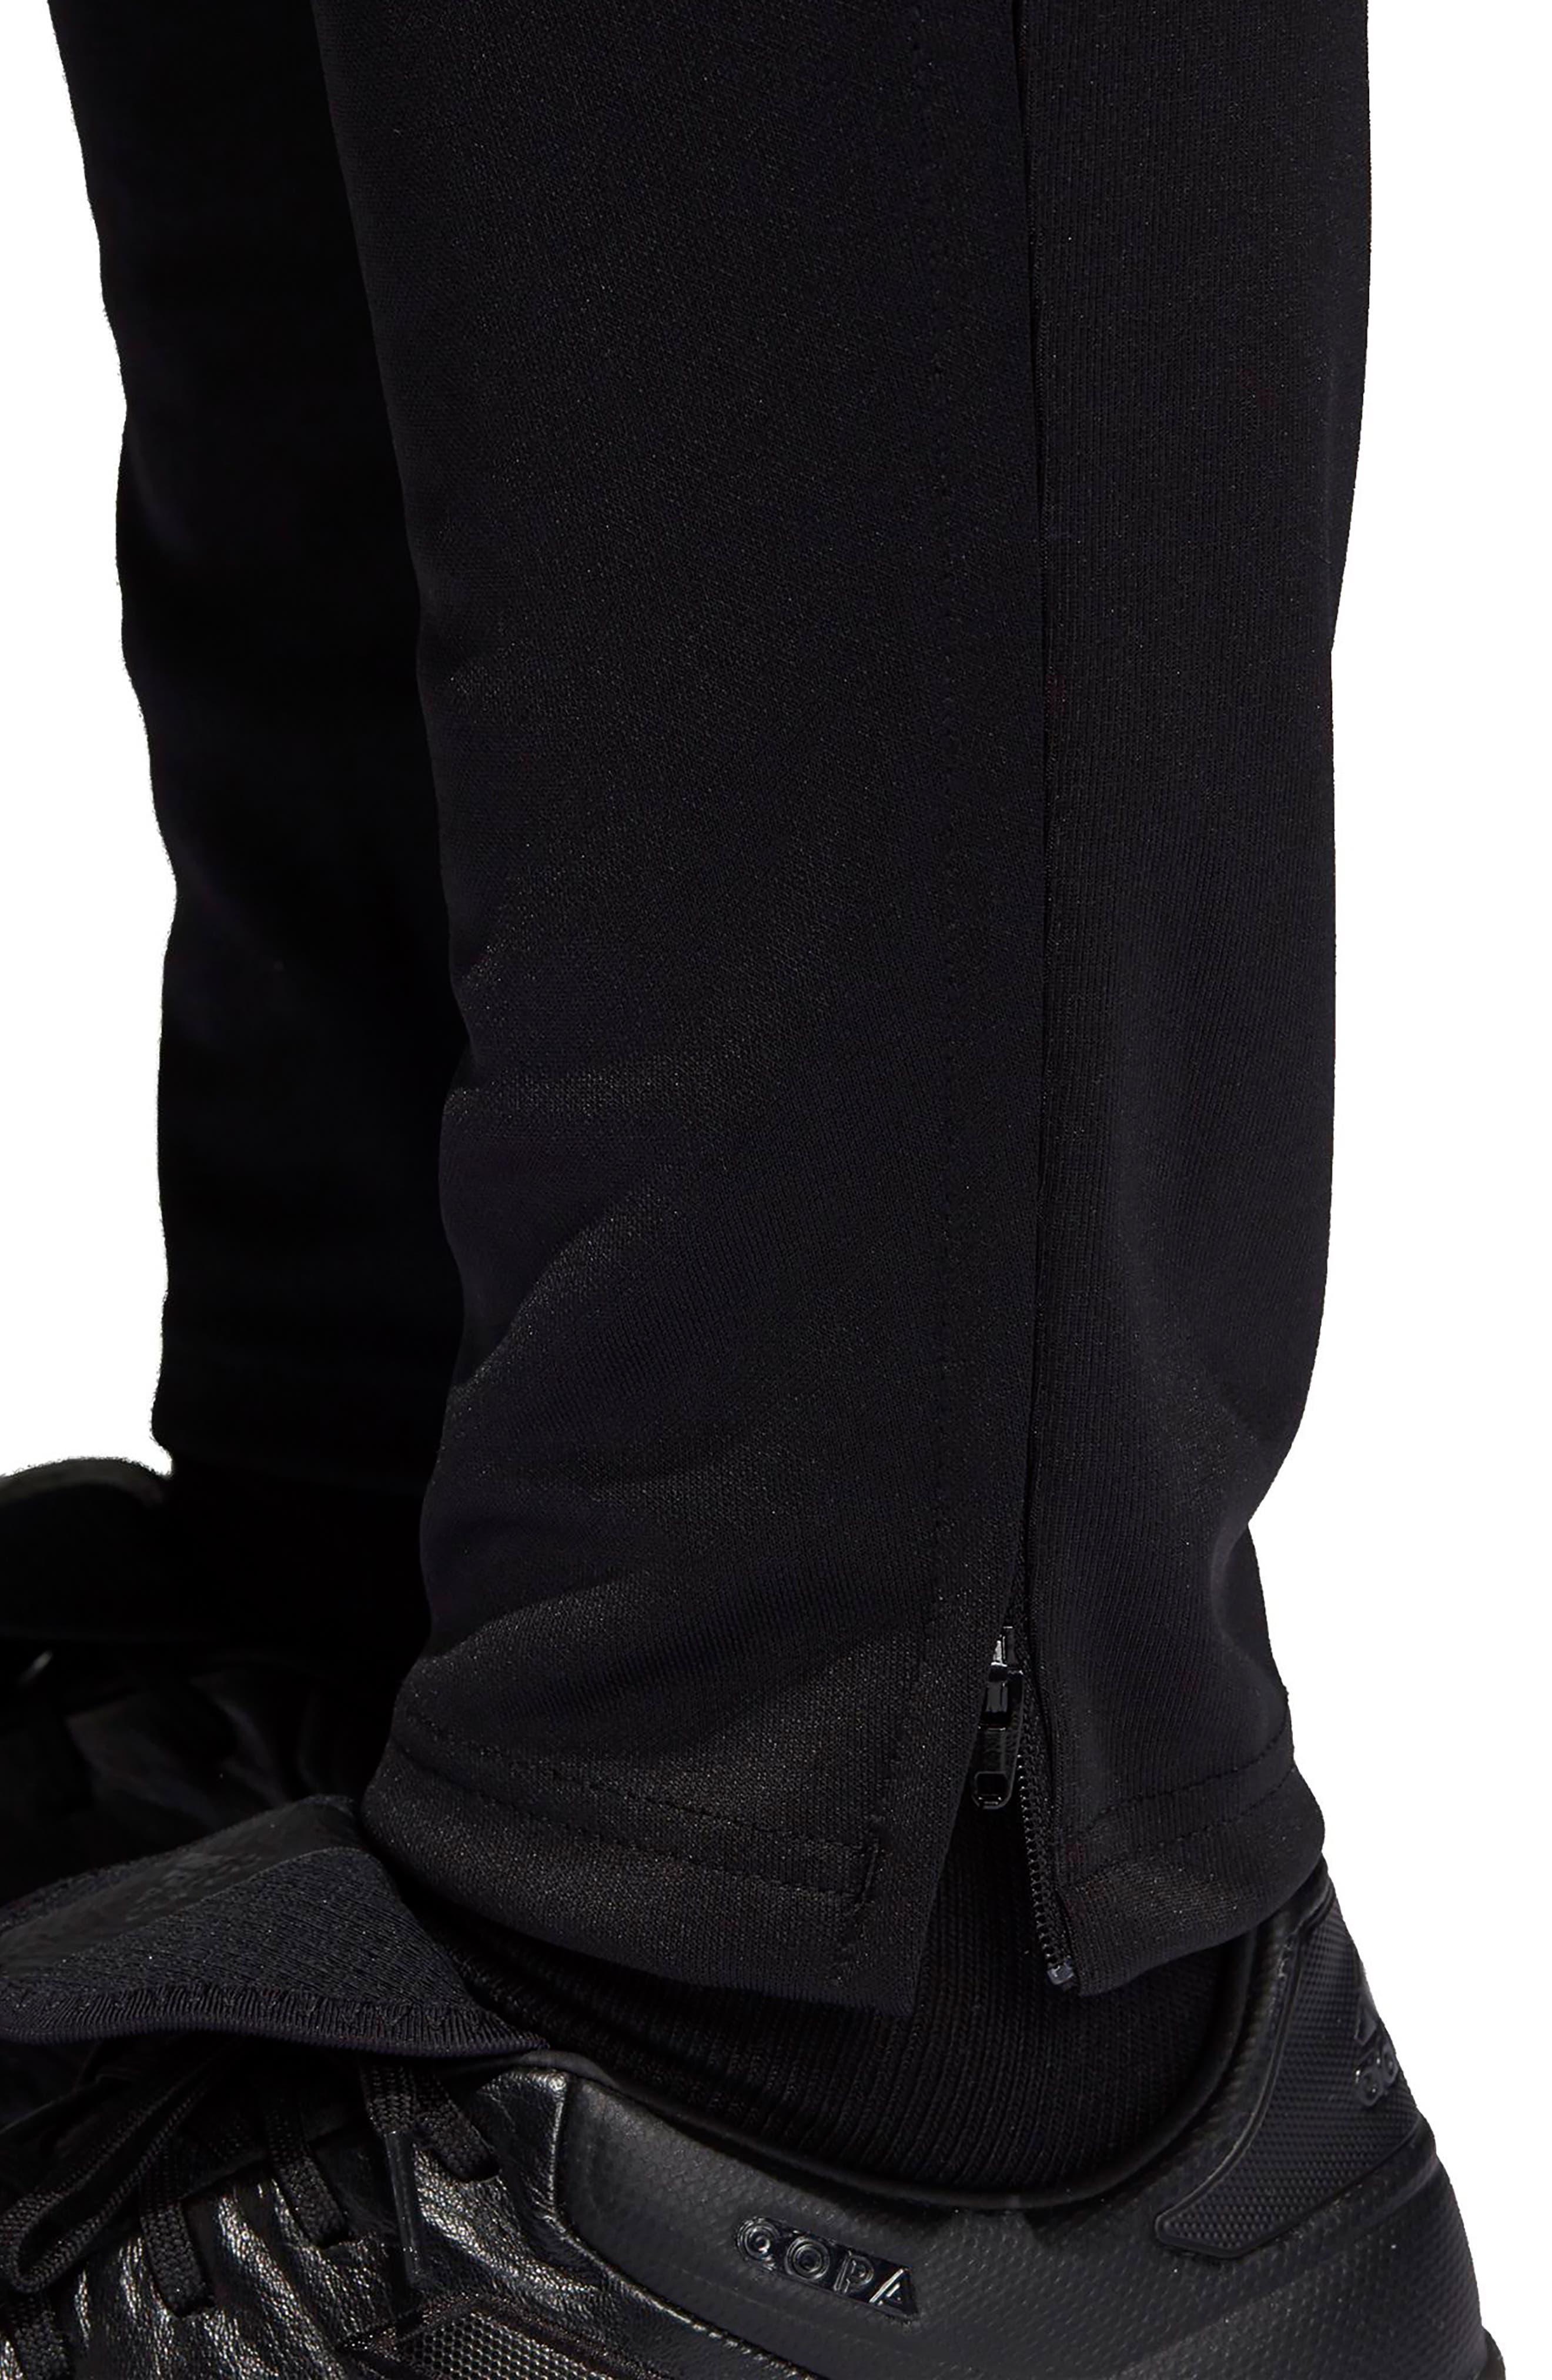 ADIDAS, Tiro 17 Regular Fit Training Pants, Alternate thumbnail 7, color, BLACK/ RED/ WHITE/ BLUE